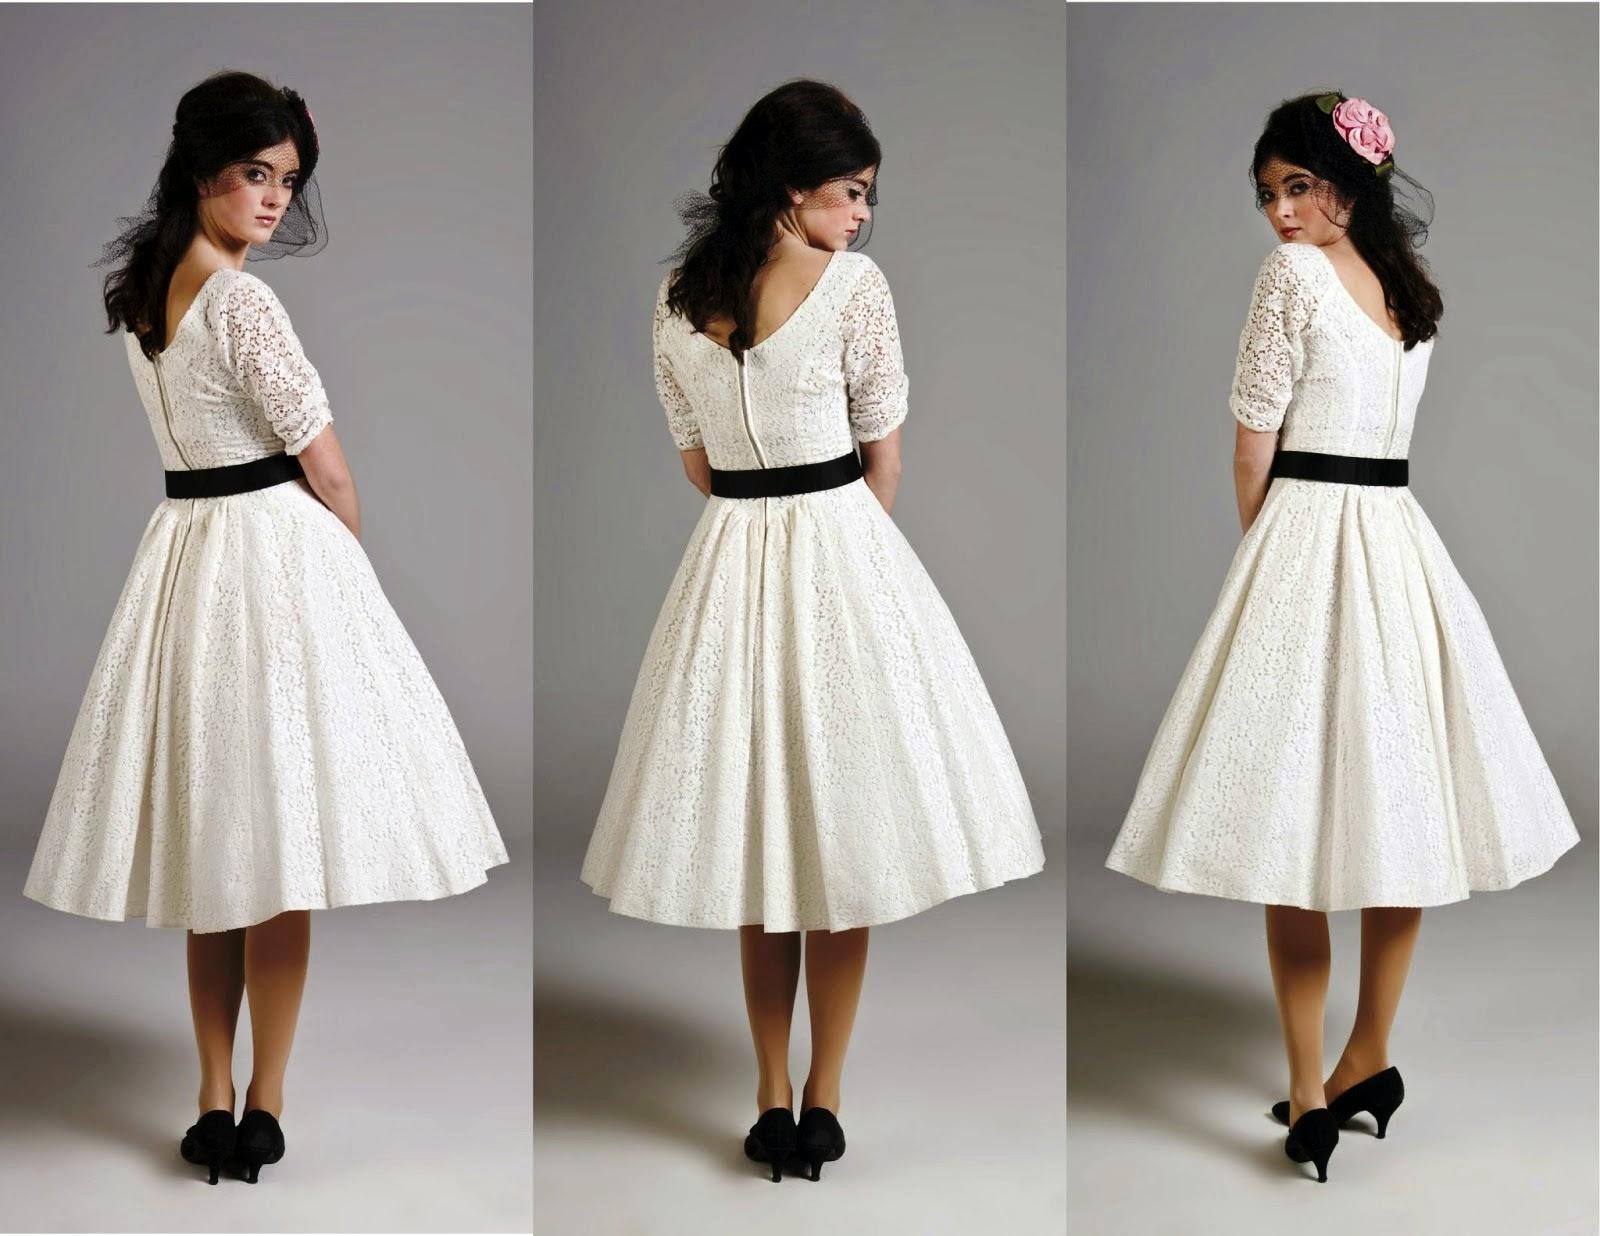 Cheap online vintage clothing uk